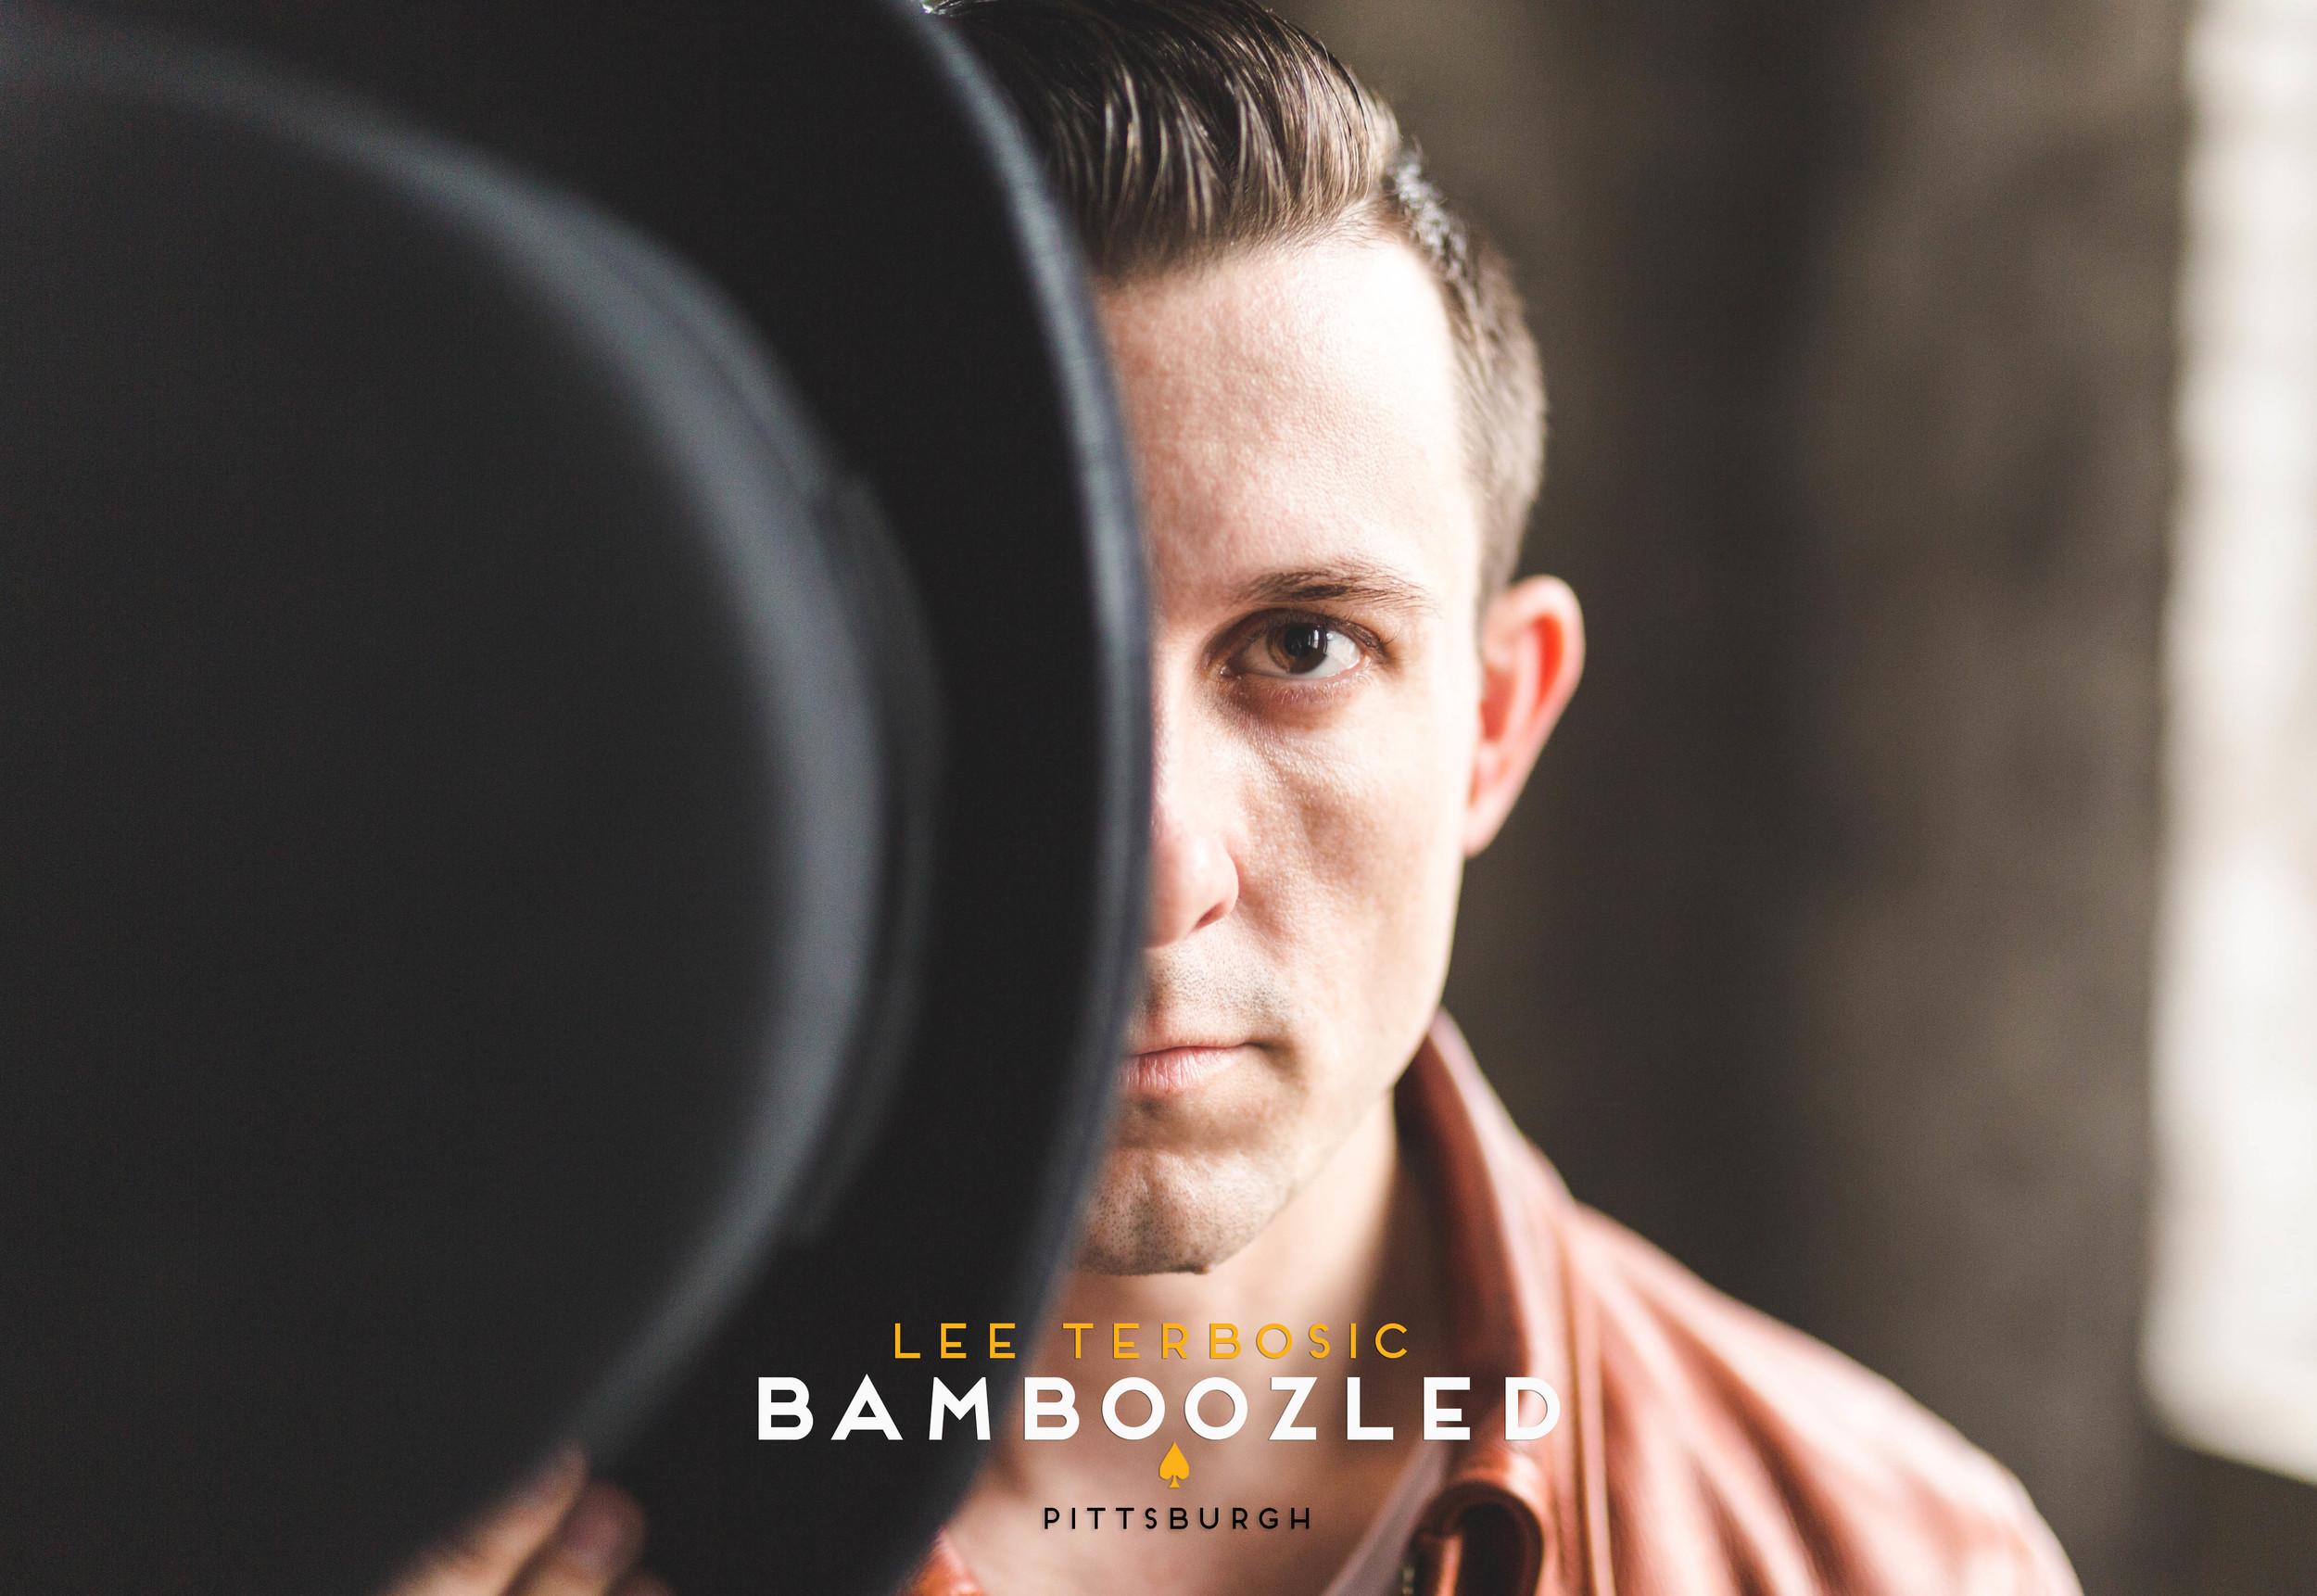 Lee Terbosic-Bamboozled-Image & Logo-1.jpg